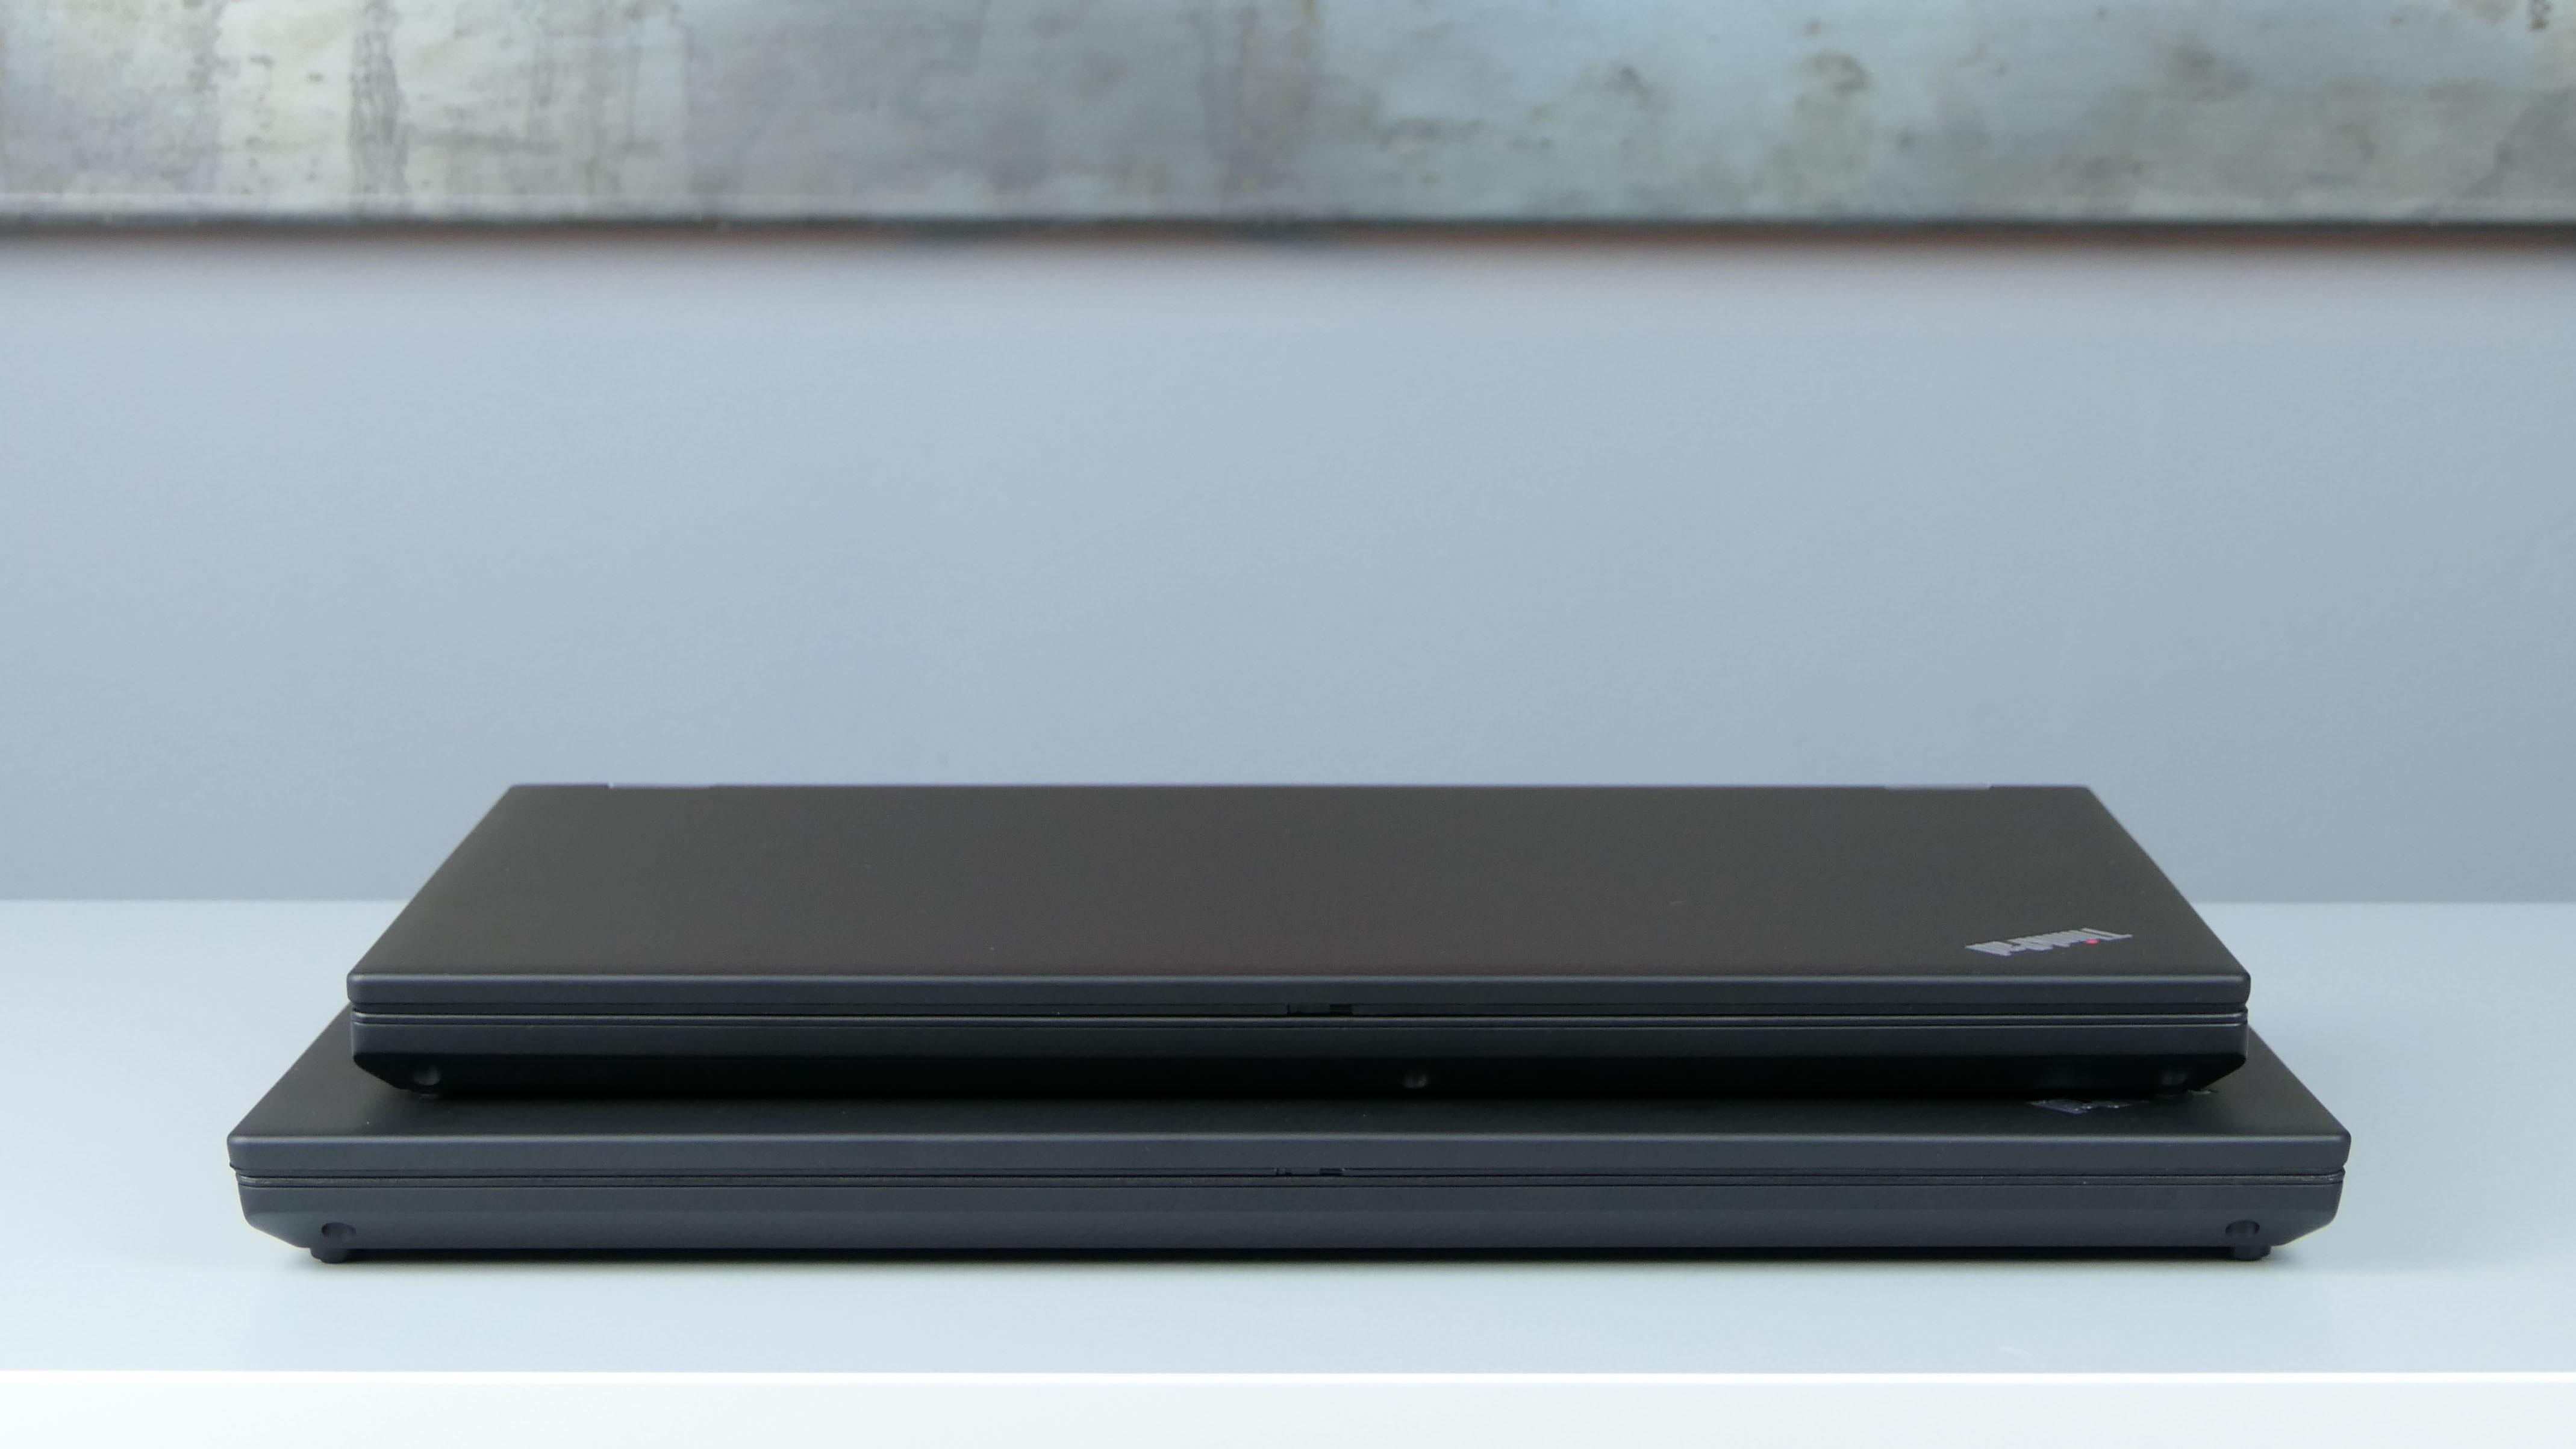 Lenovo ThinkPad P53 iP73 - front notebooków